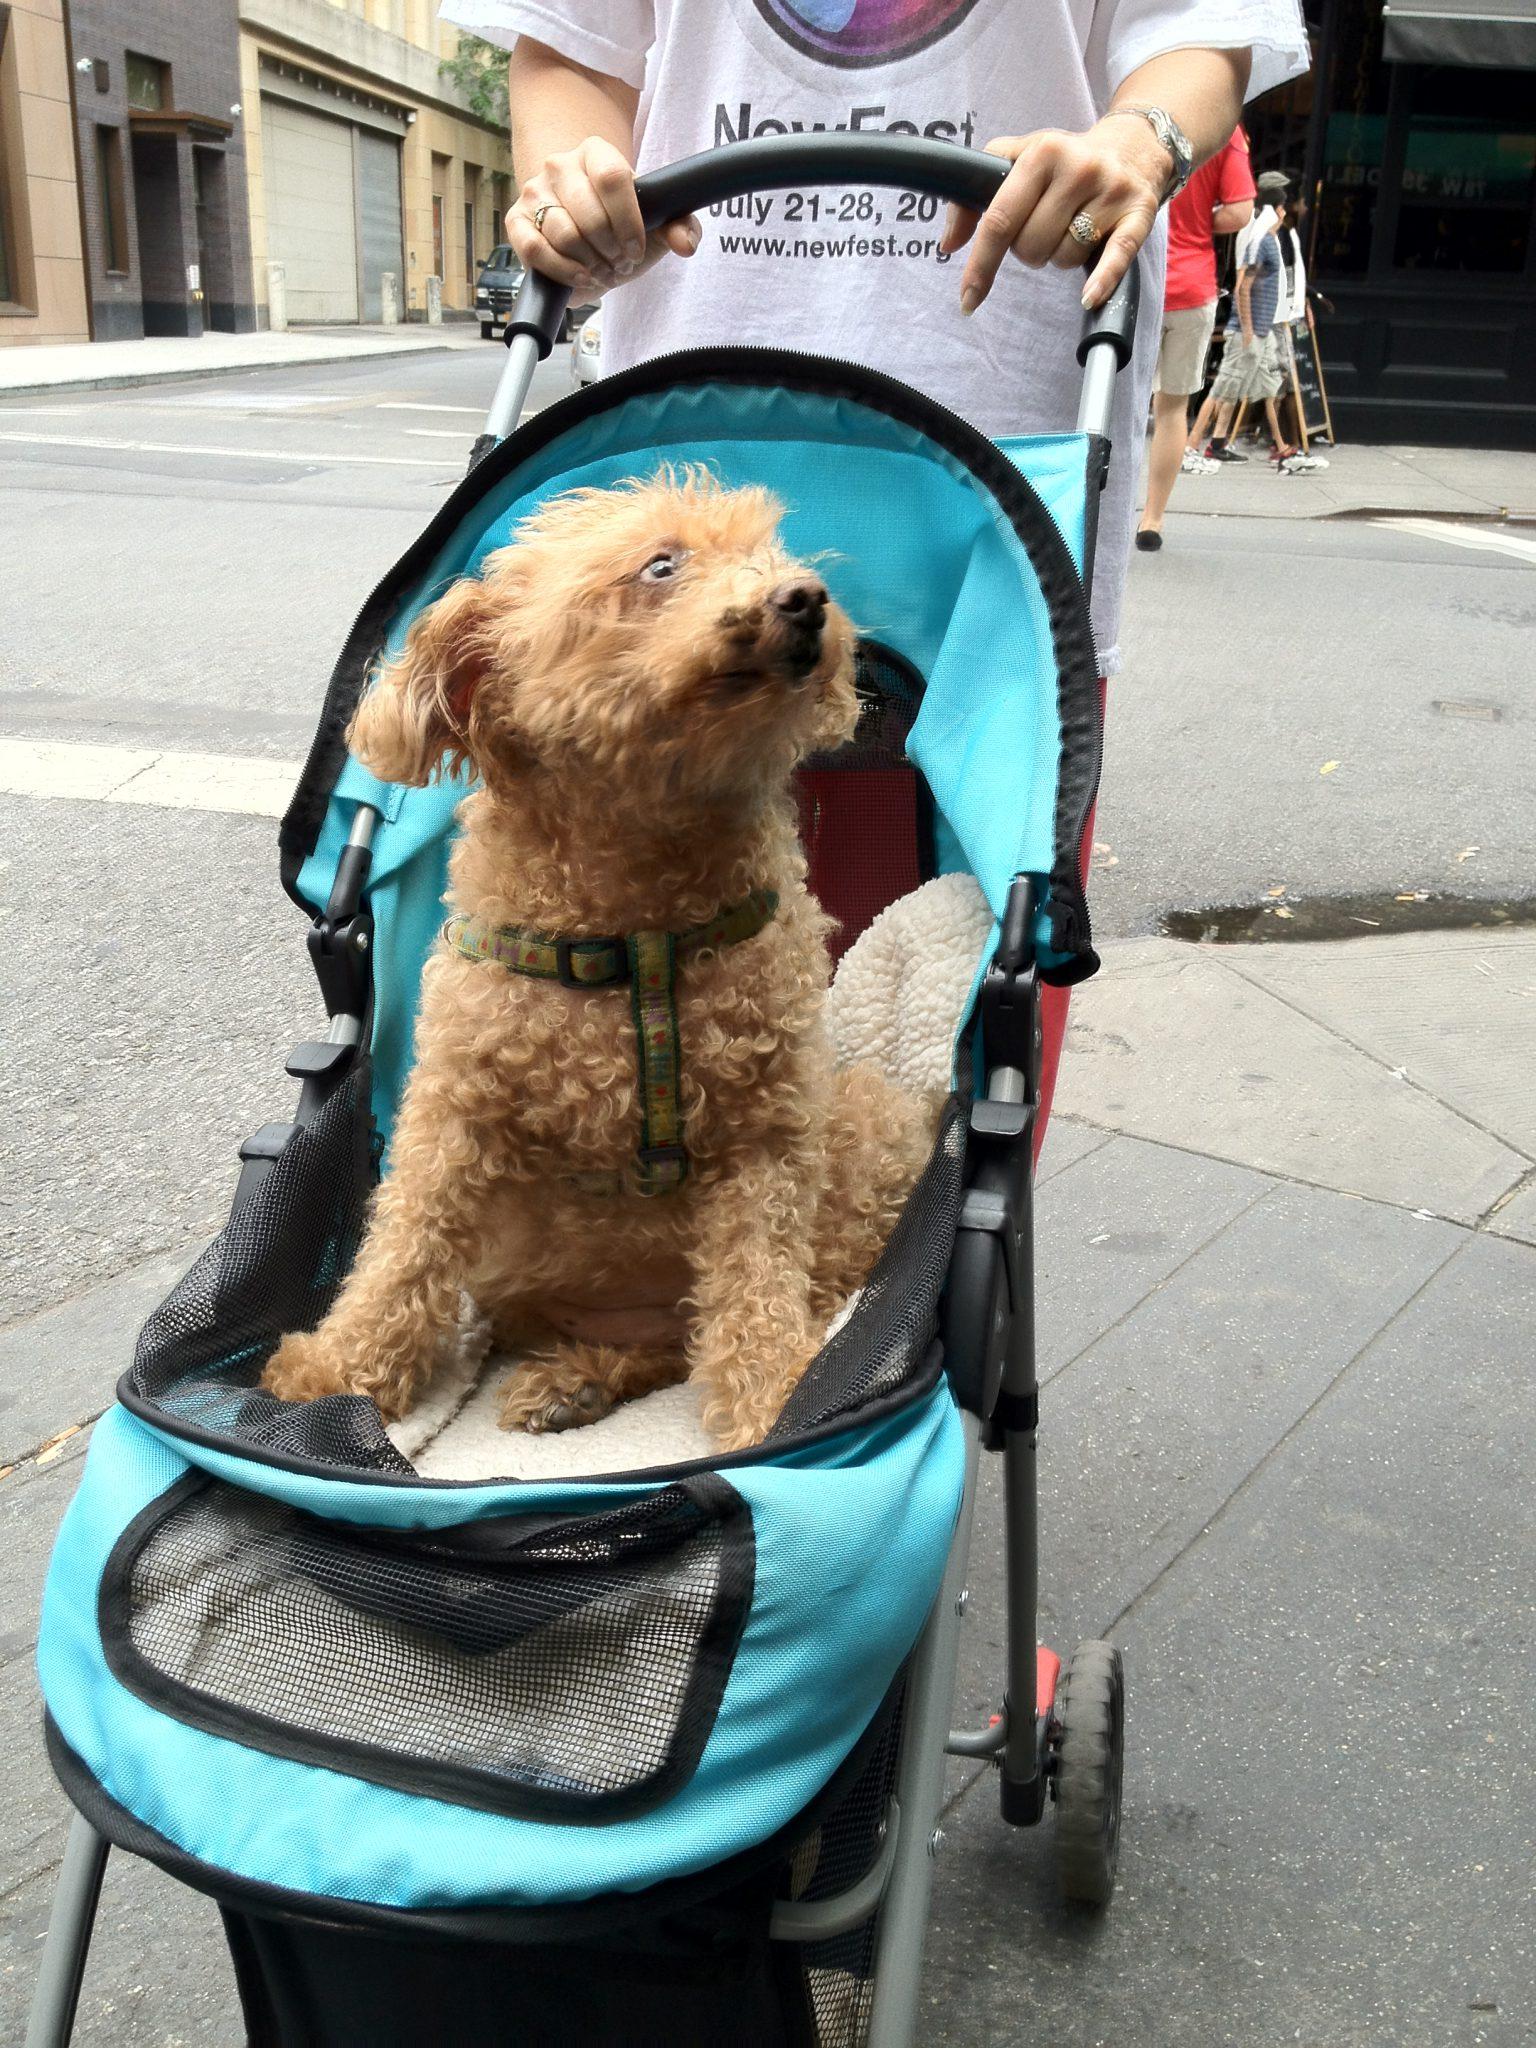 Dog in a stroller